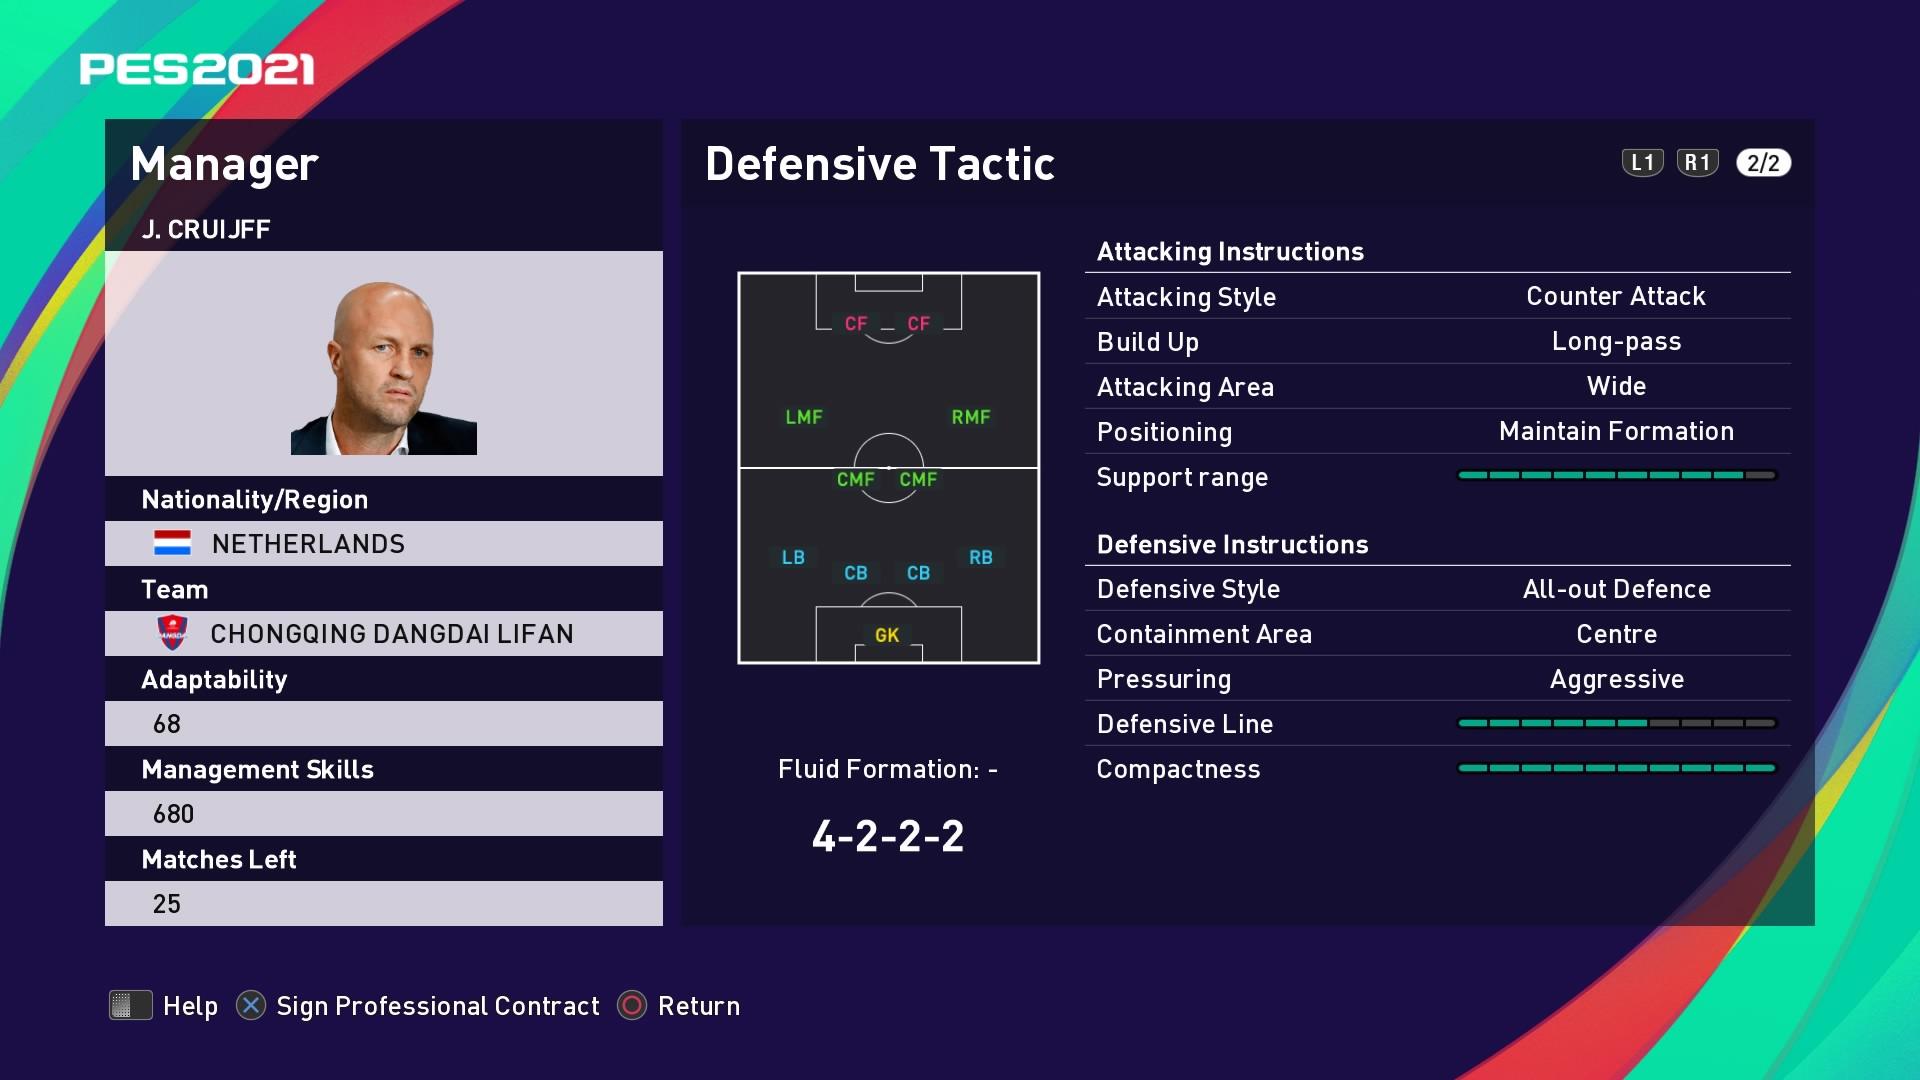 J. Cruijff (Jordi Cruijff) Defensive Tactic in PES 2021 myClub